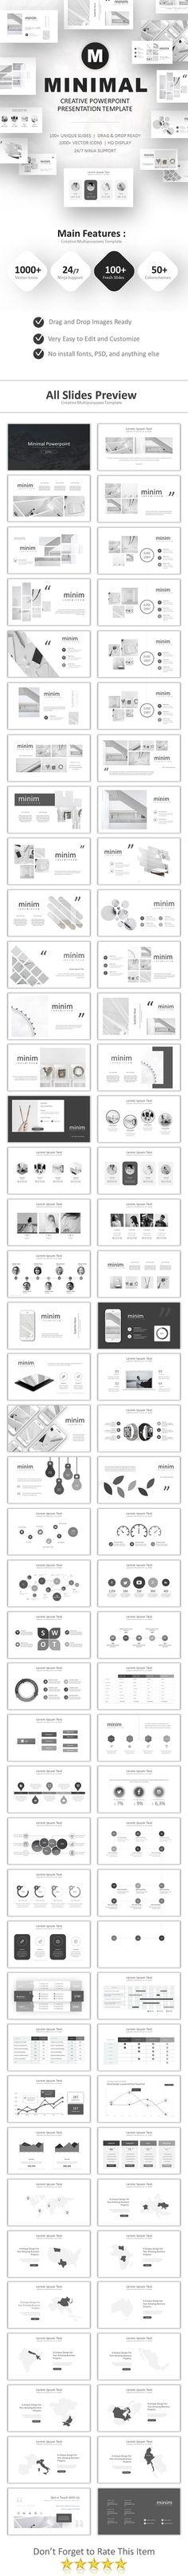 Minimal Powerpoint Template 100+ Unique Slides. Download here: https://graphicriver.net/item/minimal-powerpoint/21913096?ref=ksioks